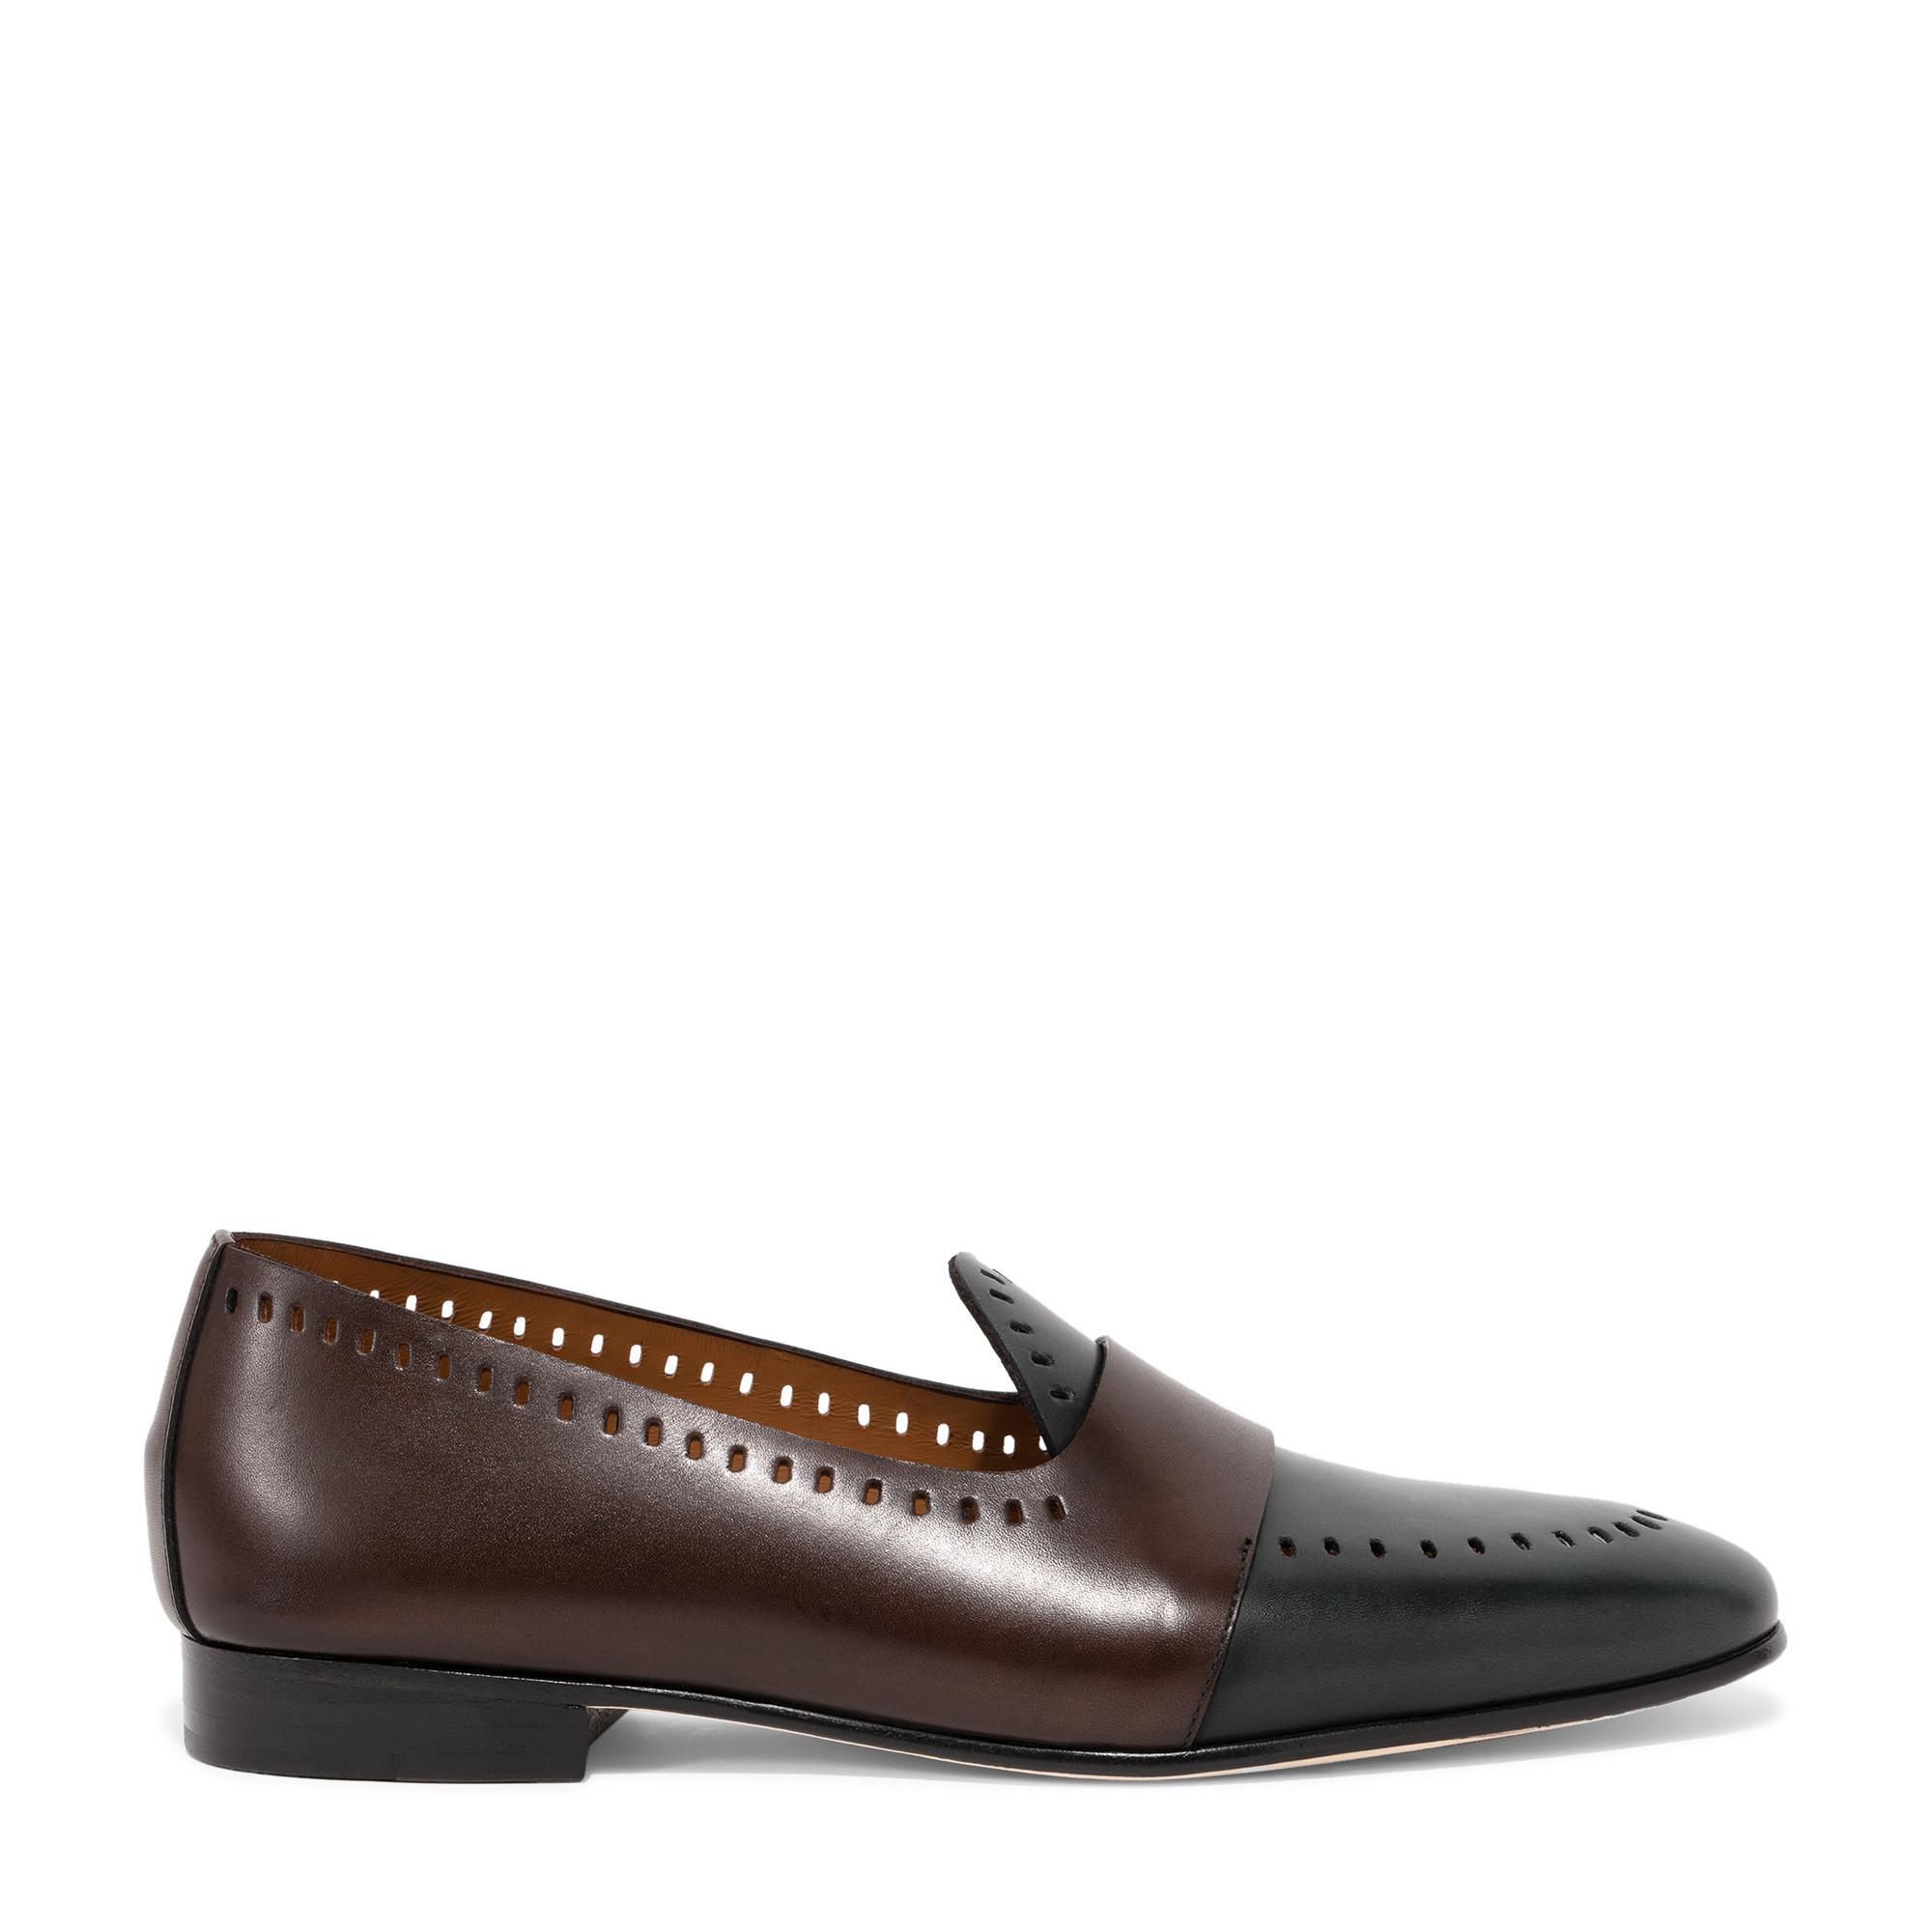 Hampton loafers